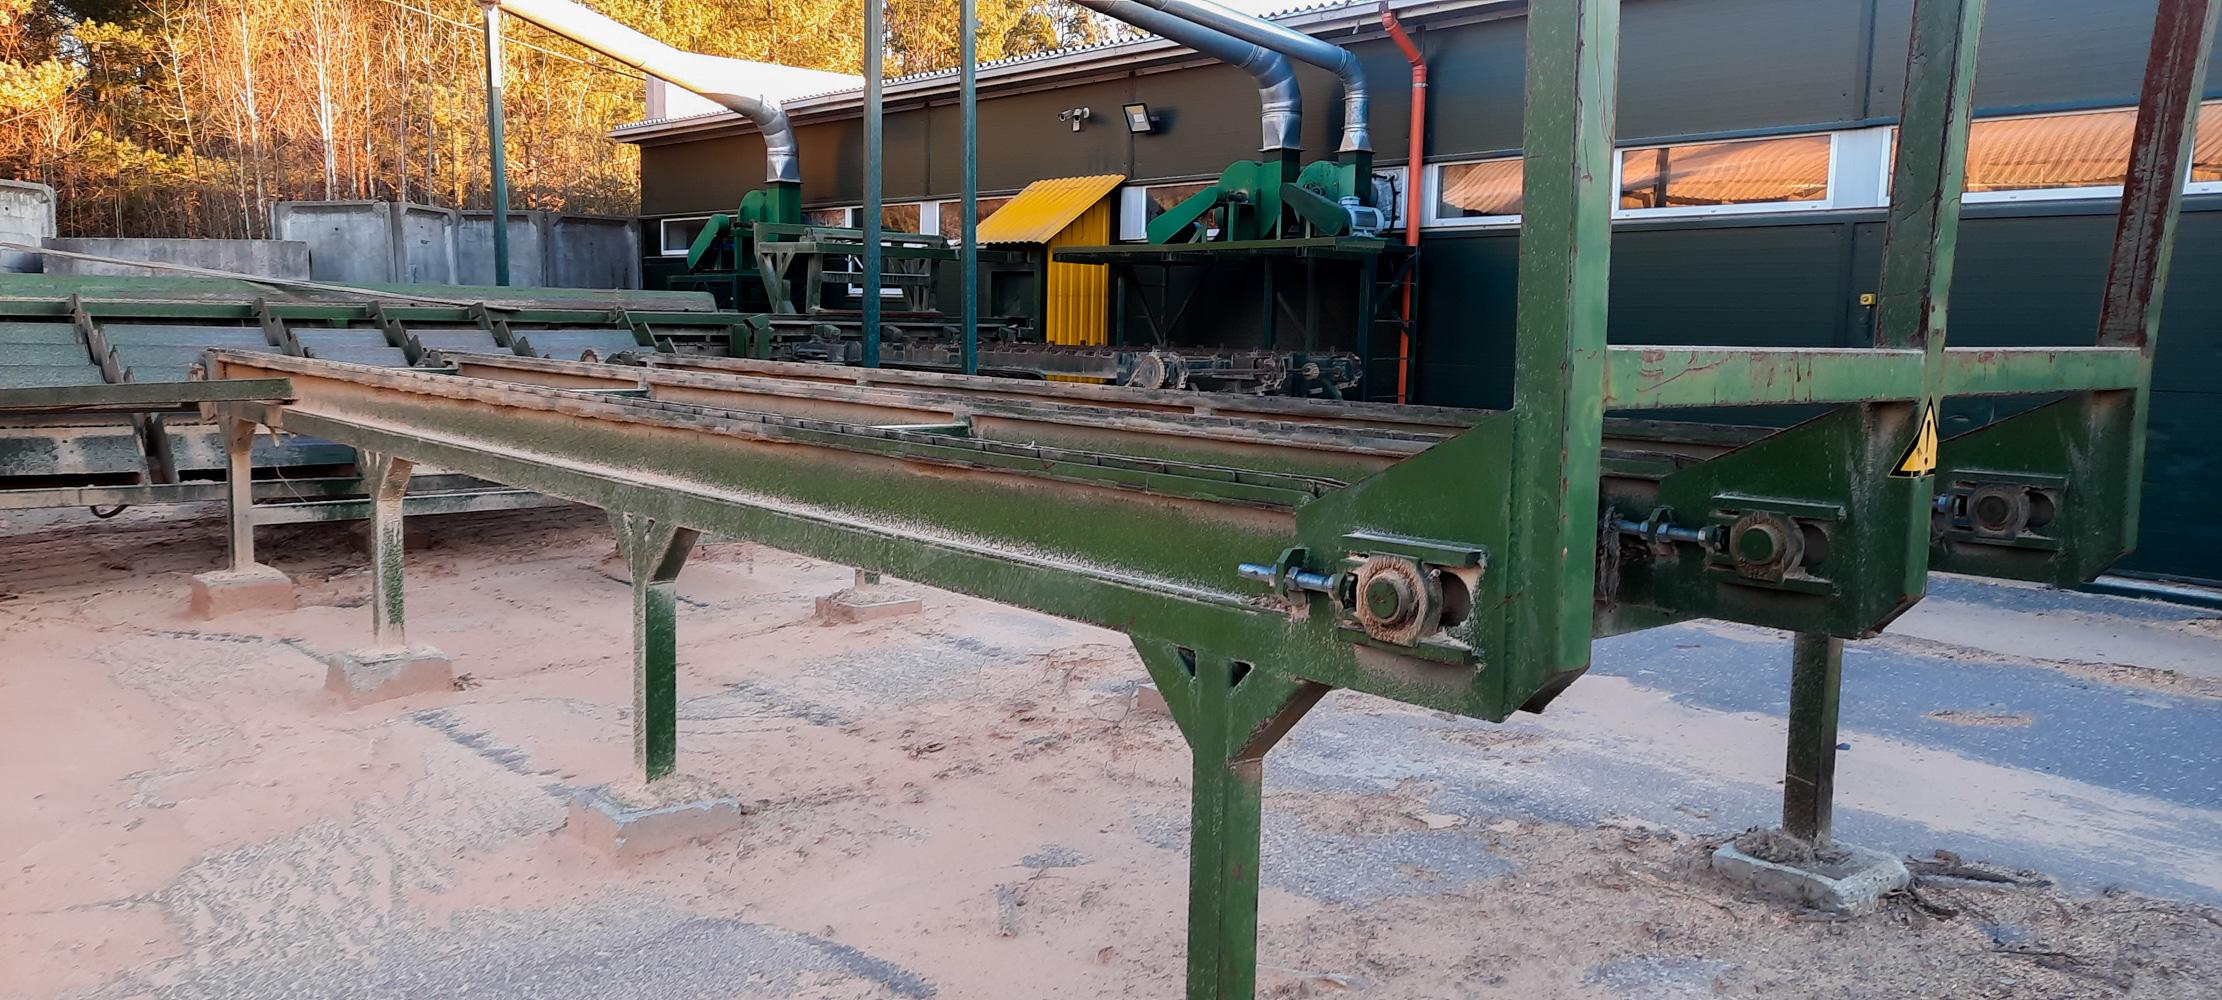 Rąstų rampa/ Logs storage platform